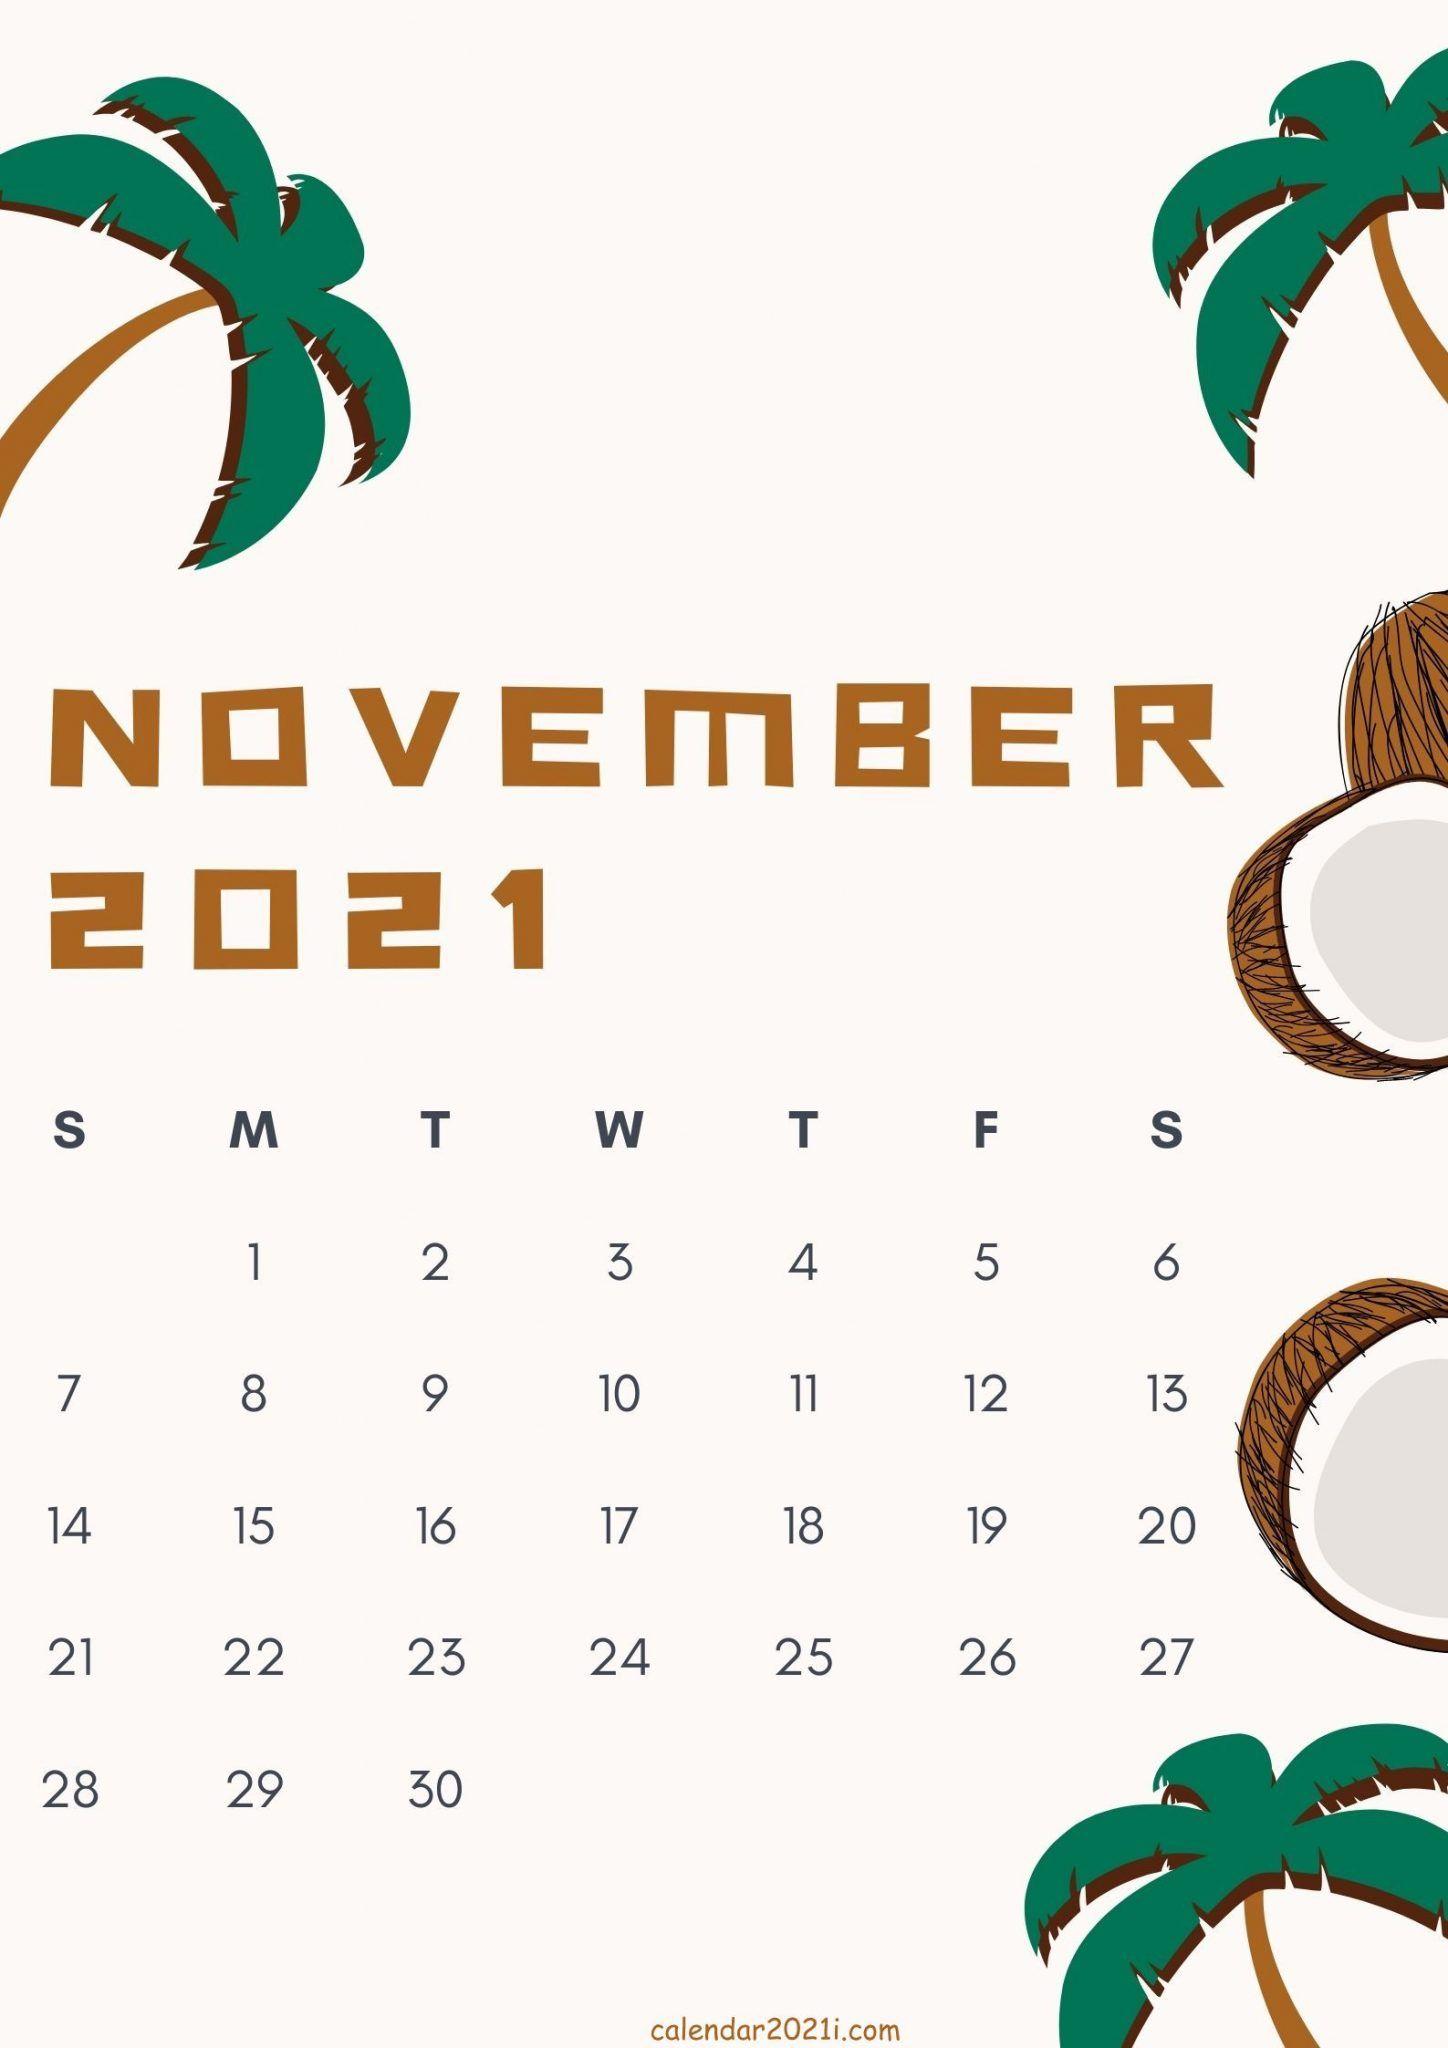 Cute November 2021 Calendar November 2021 Cute Calendar Design | Calendar design, Free